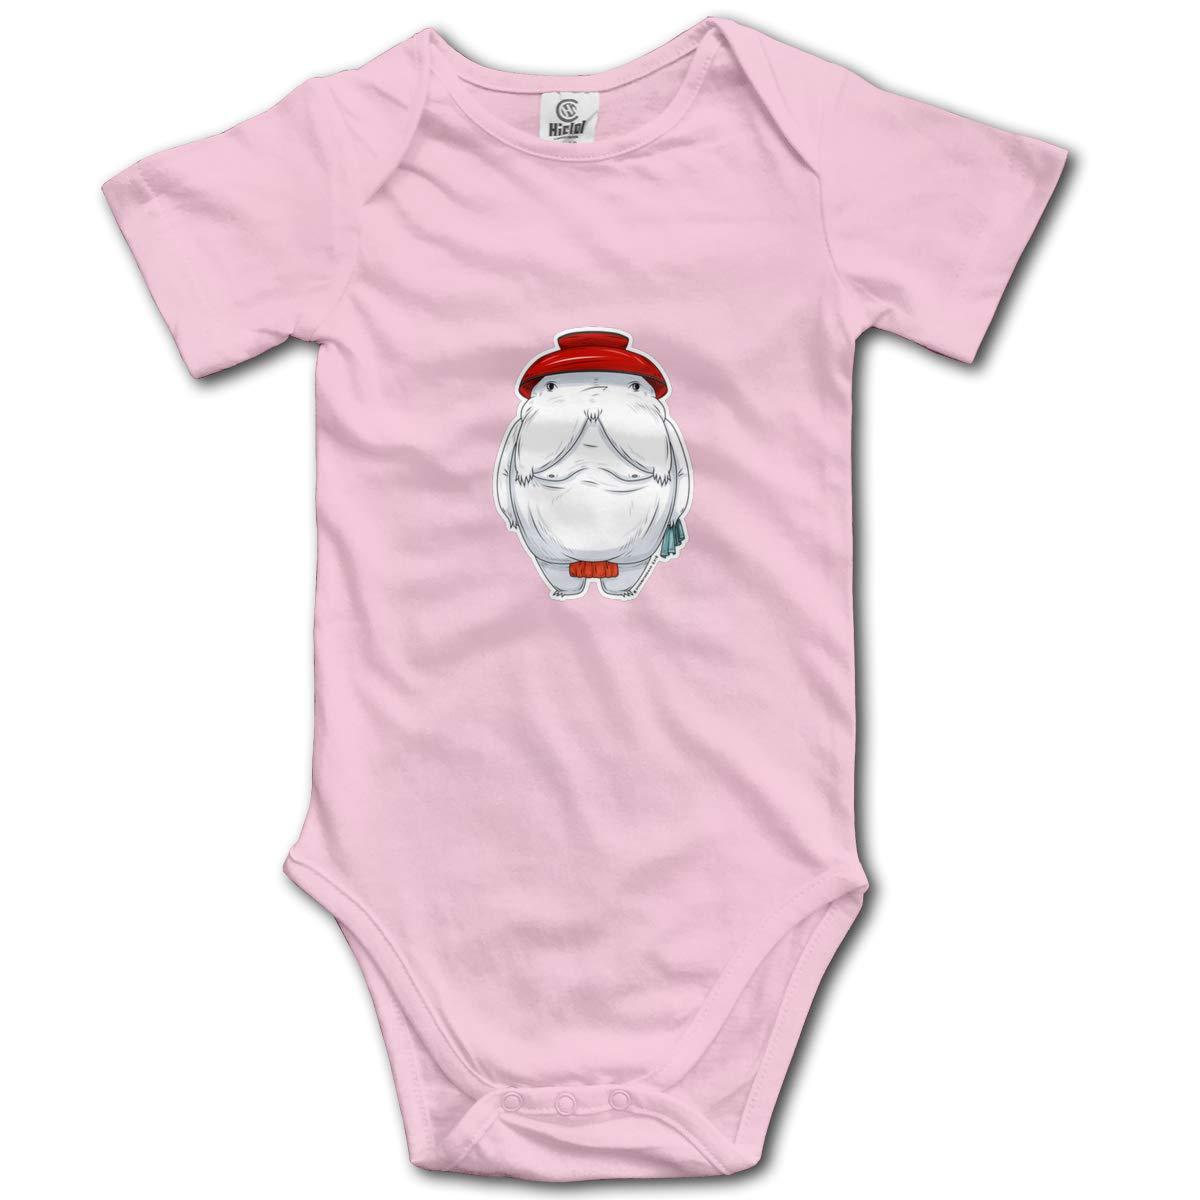 Coollifea Radish Spirit Baby Romper 0-18 Months Newborn Baby Girls Boys Layette Rompers Black